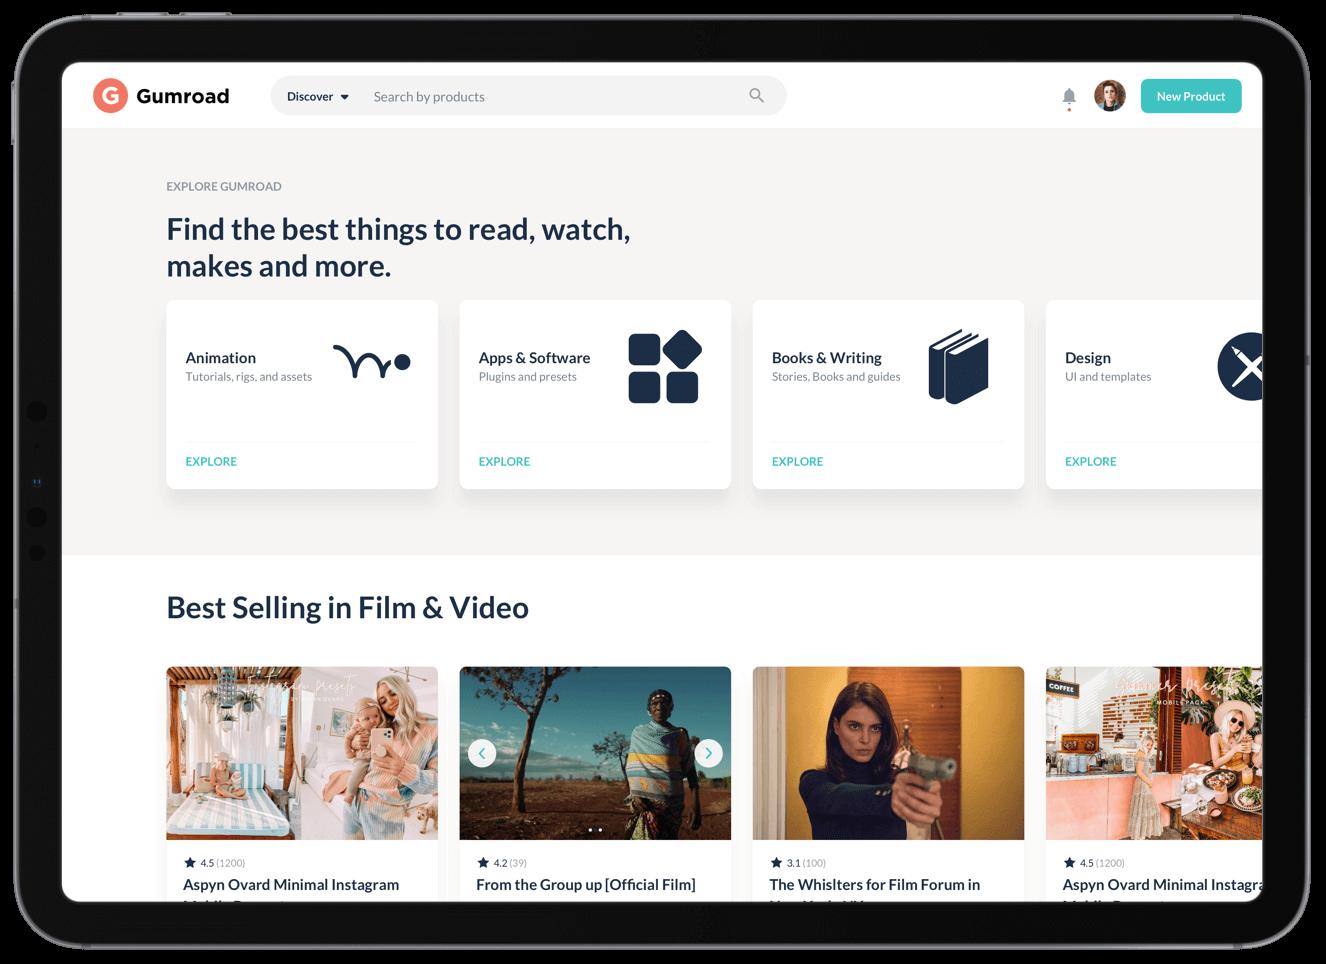 Gumroad case study homepage design